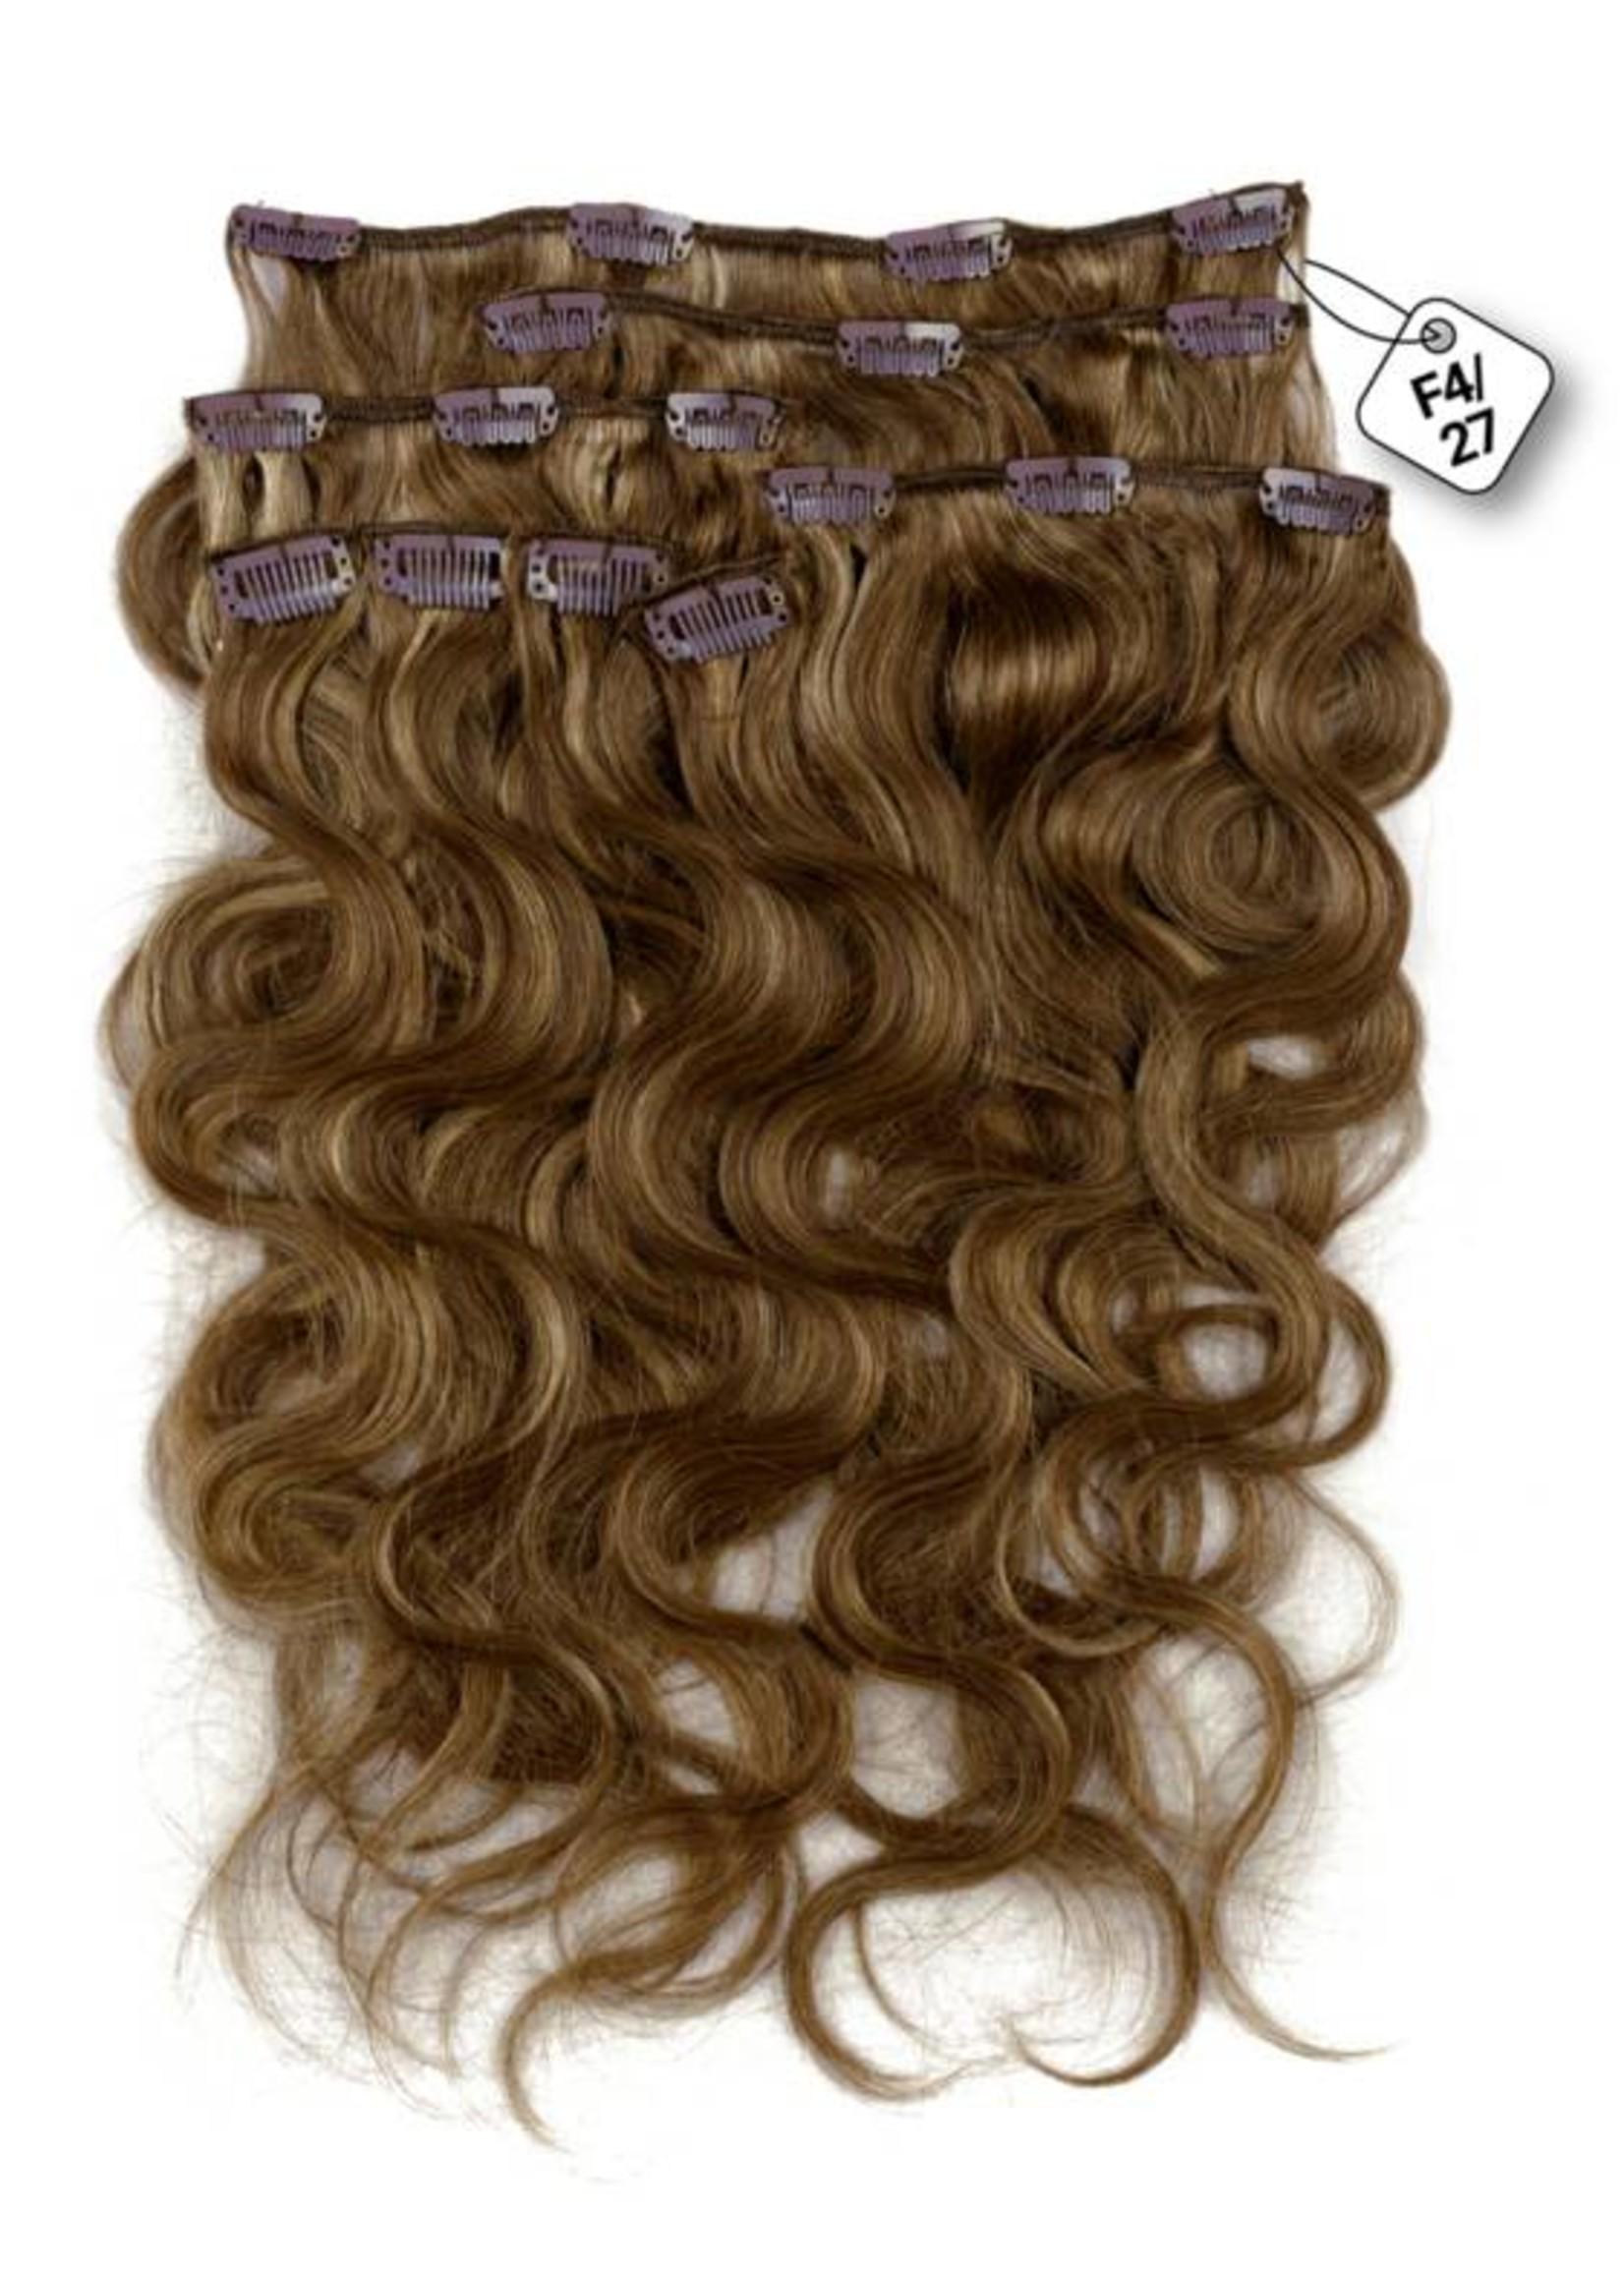 Clip in Extensions (Body Wave), kleur #4/27, Chocolate Brown/ Dark Blonde